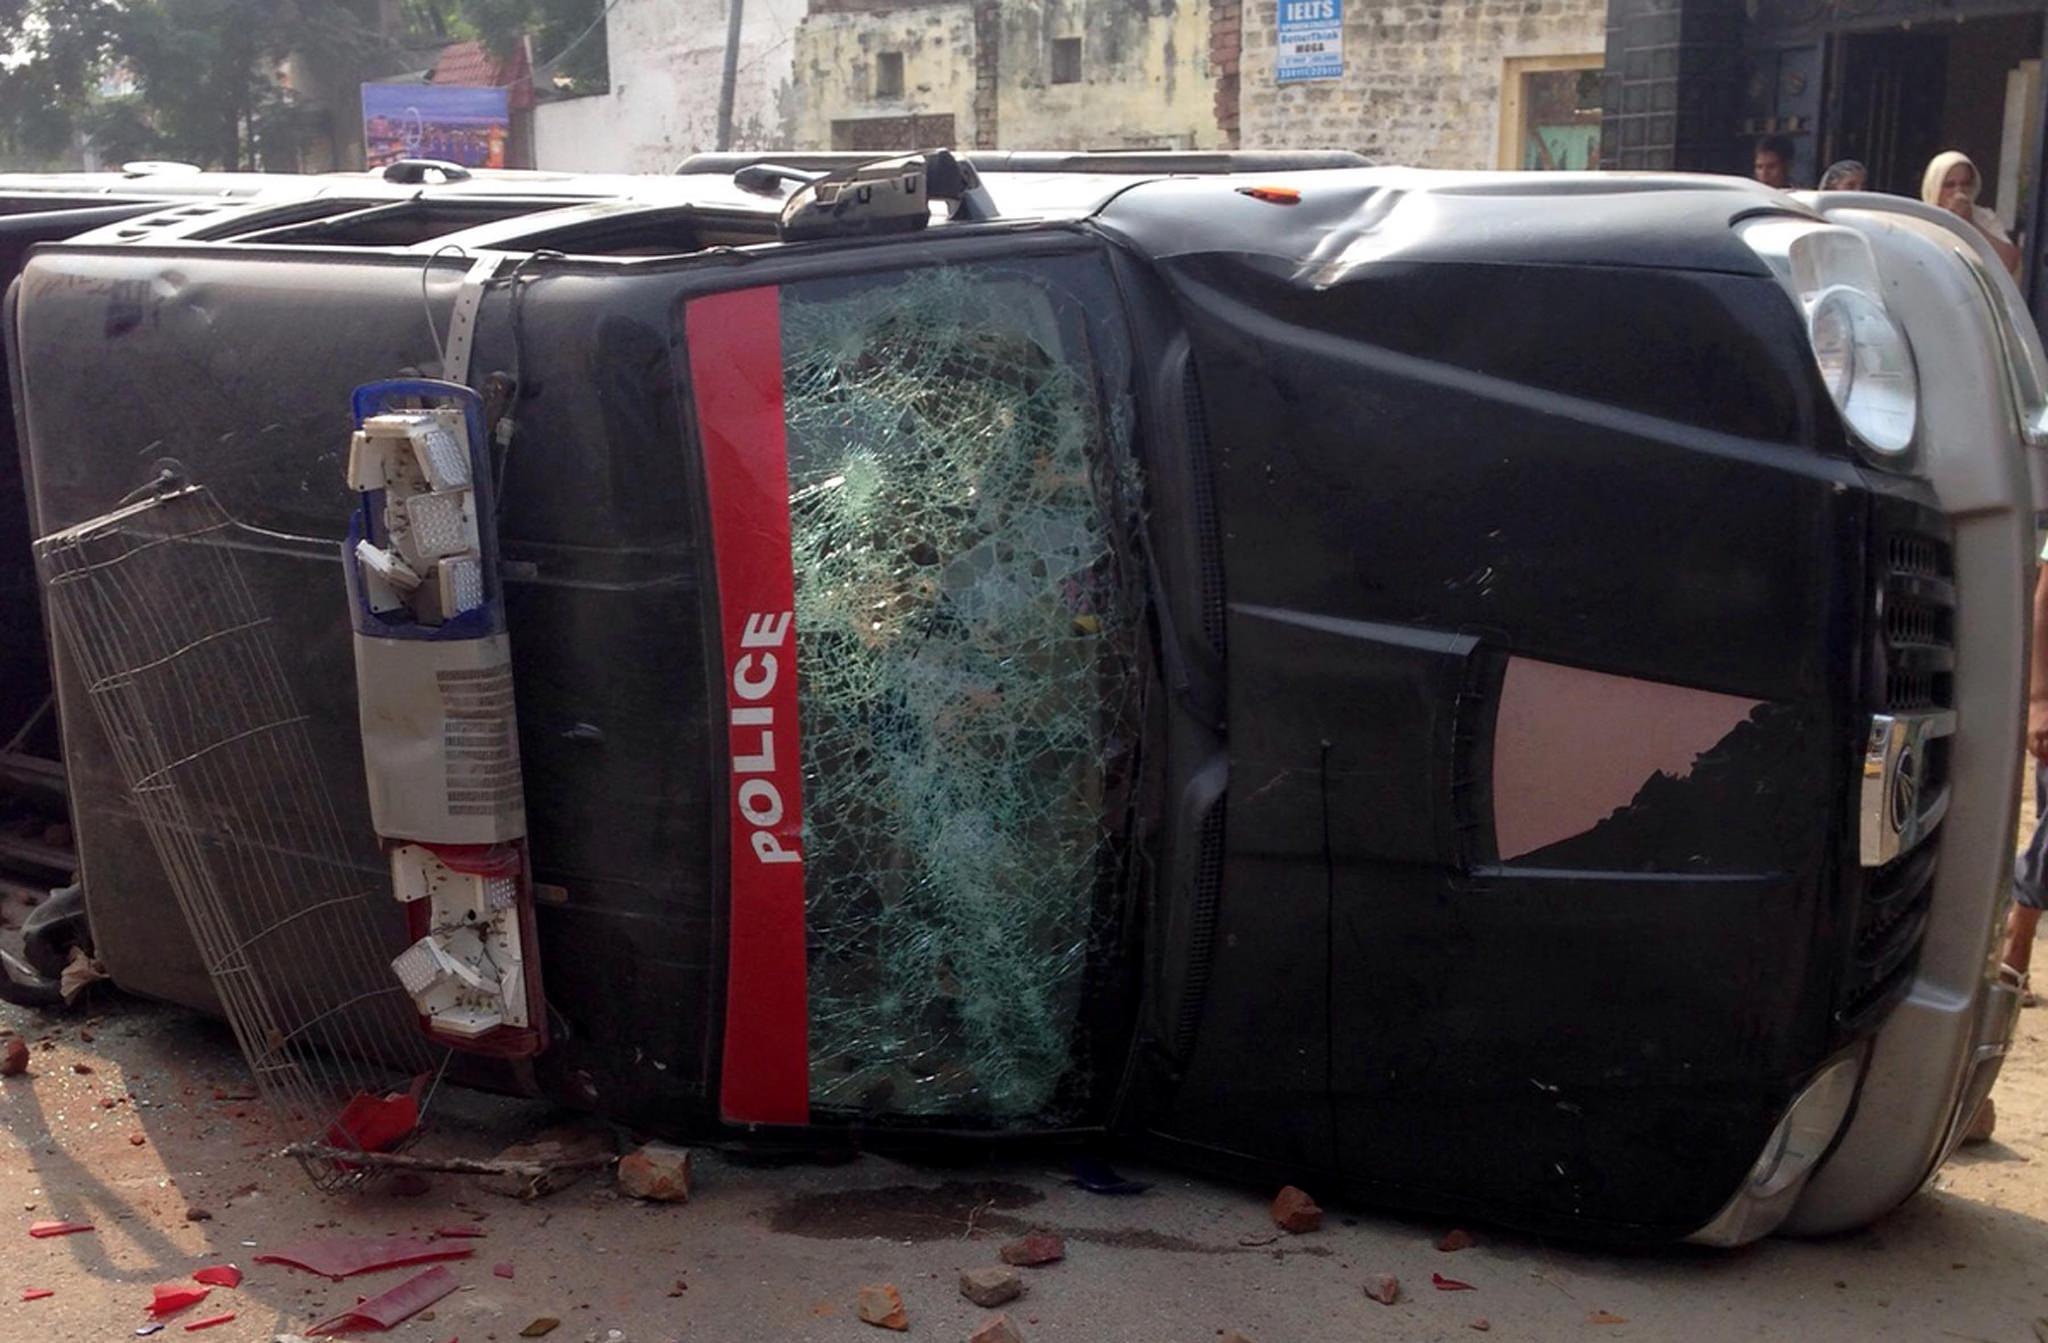 A police van destroyed by protestors. Credit: IANS